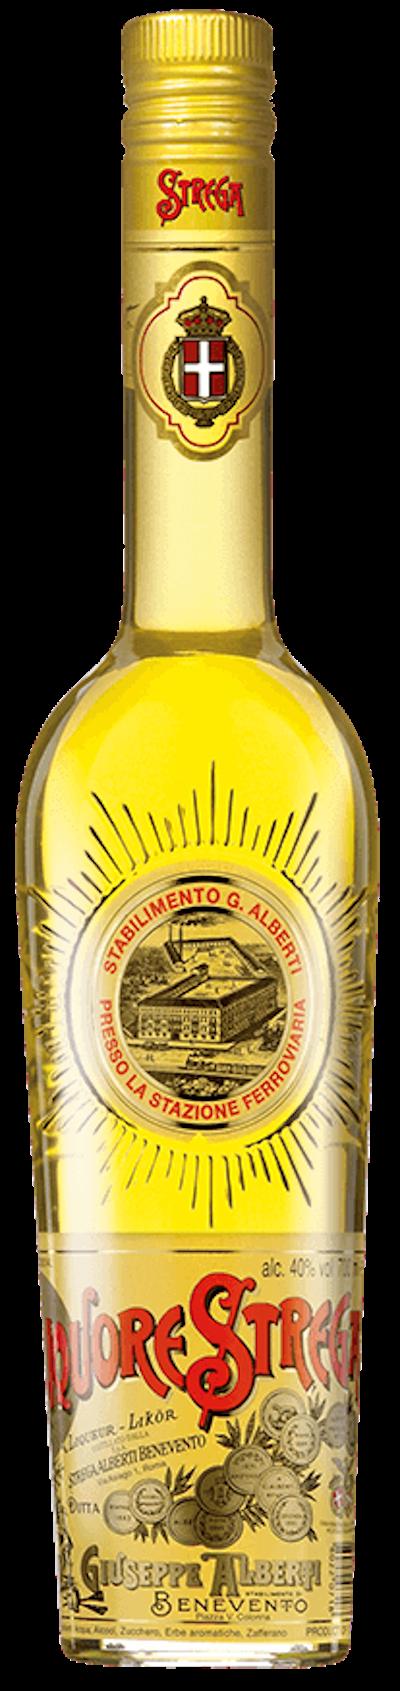 Alberti - Liquore Strega